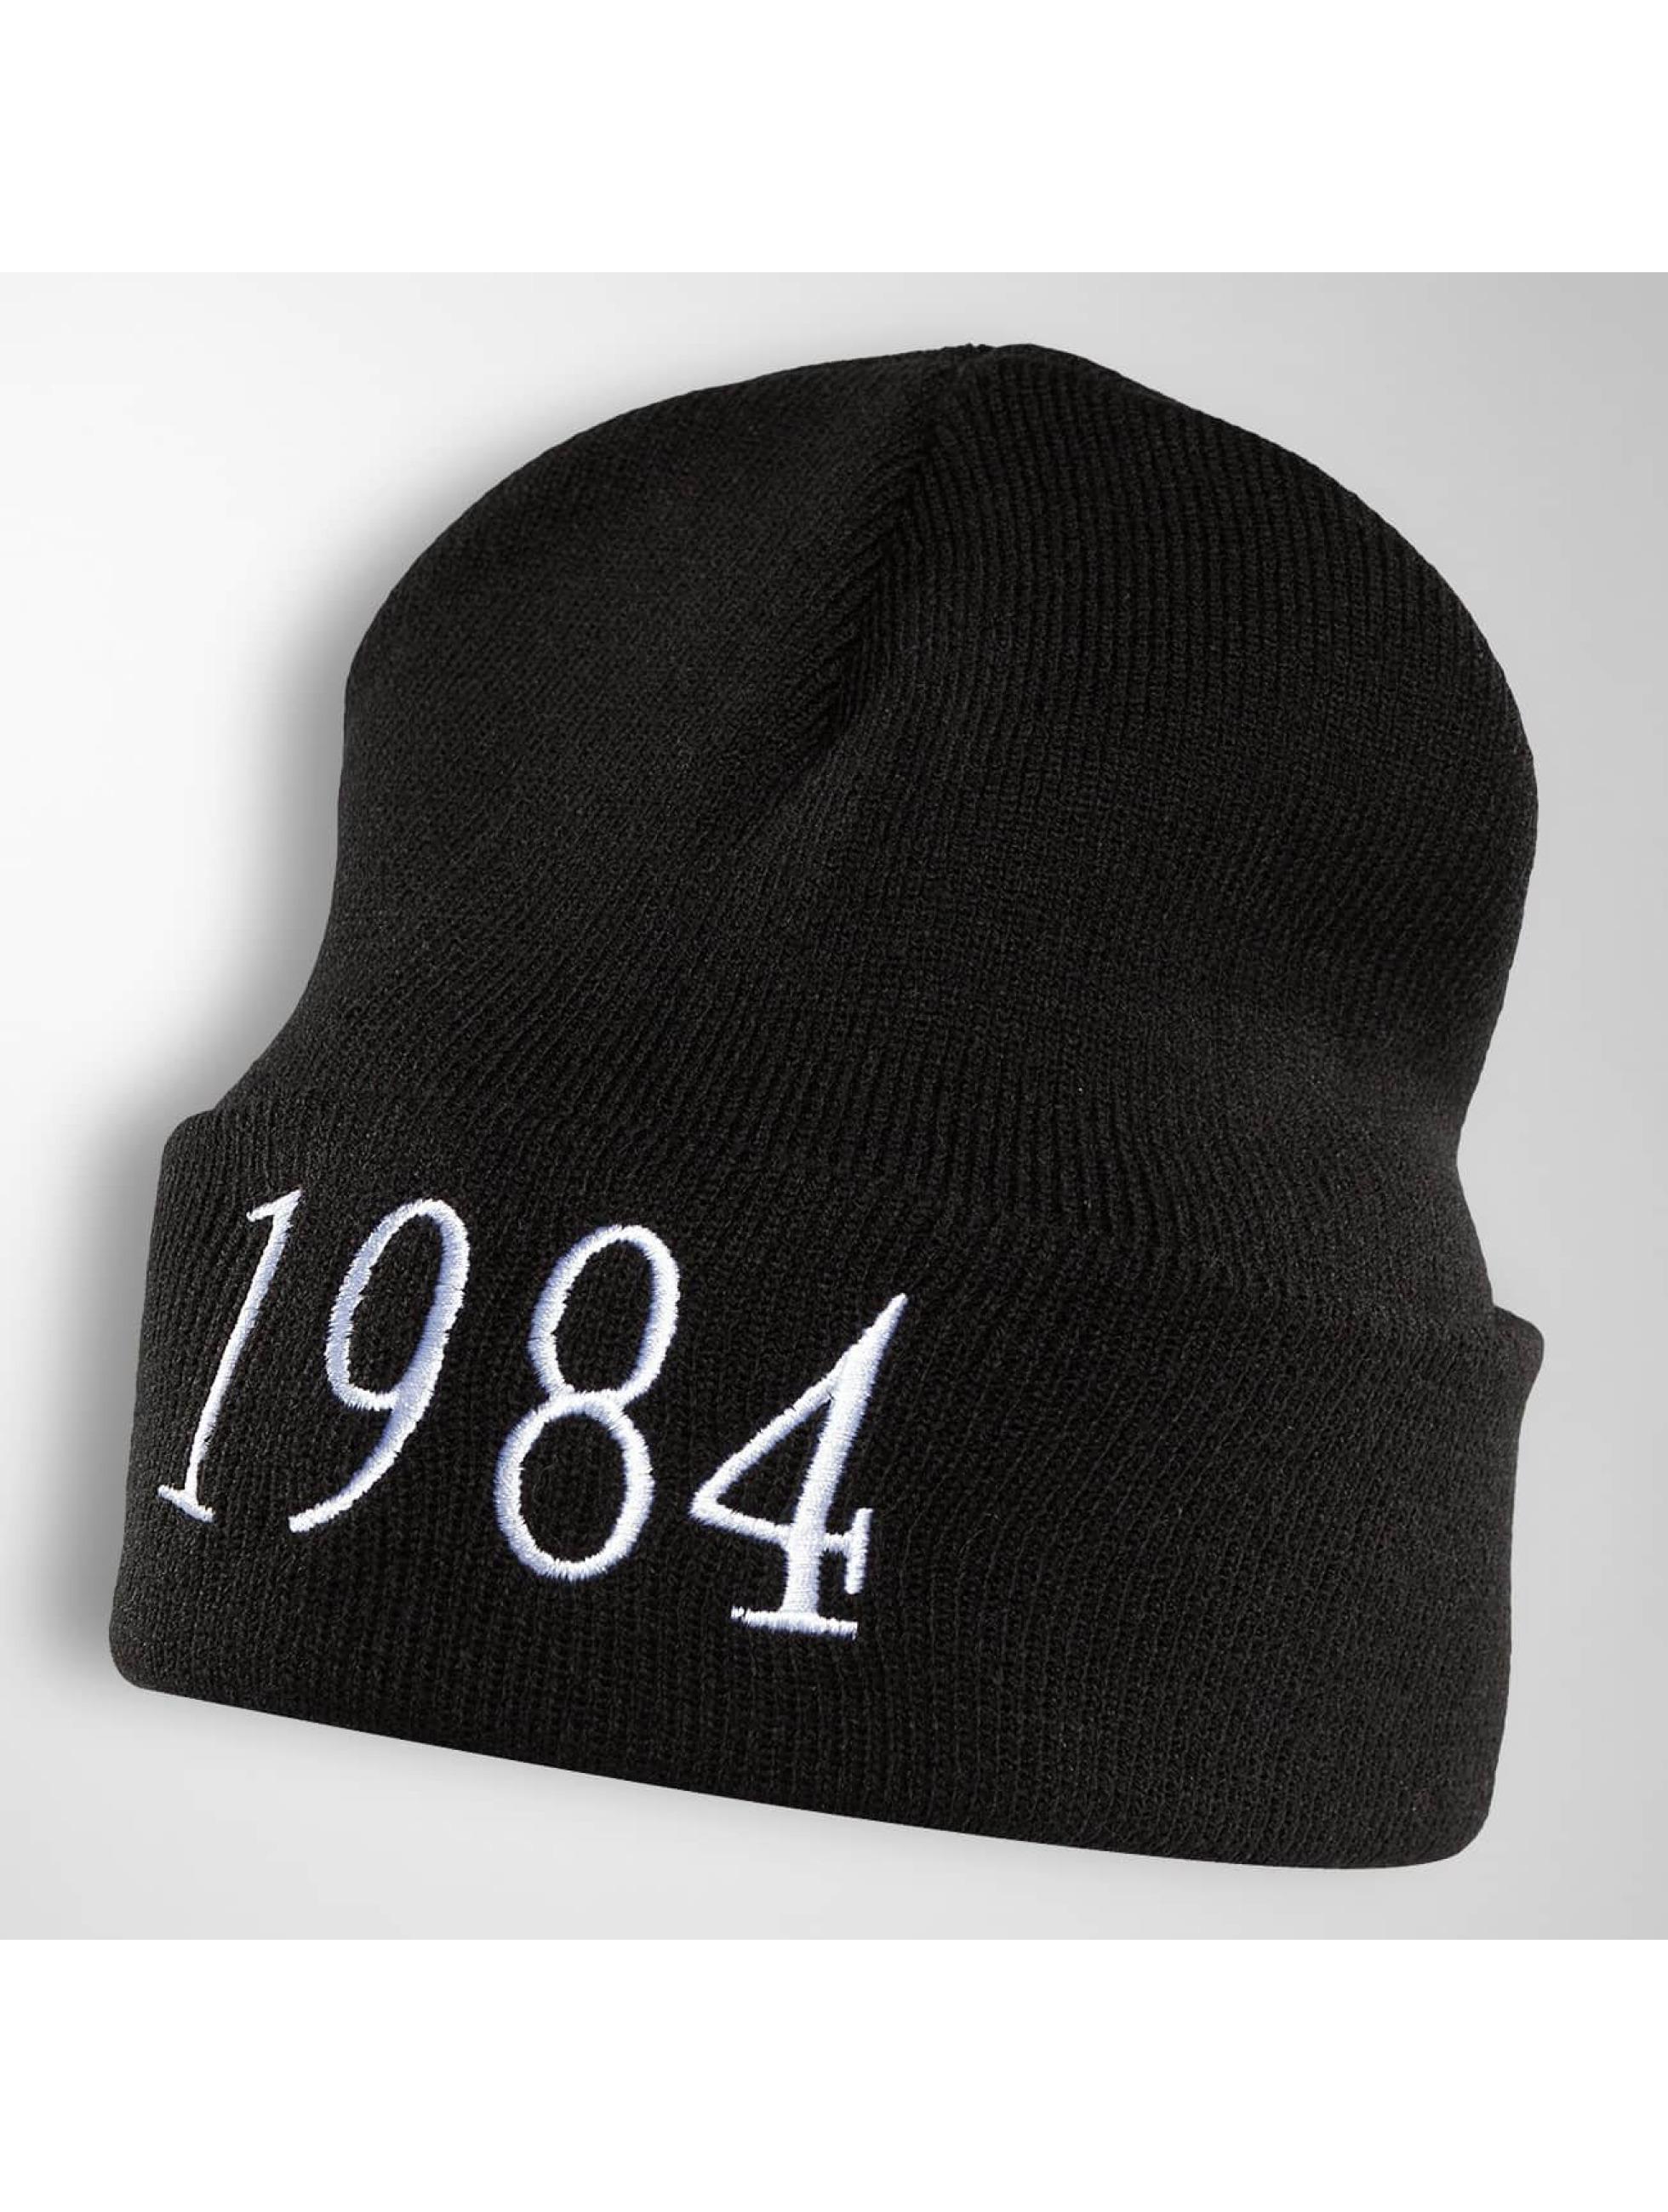 TrueSpin Beanie 1984 black